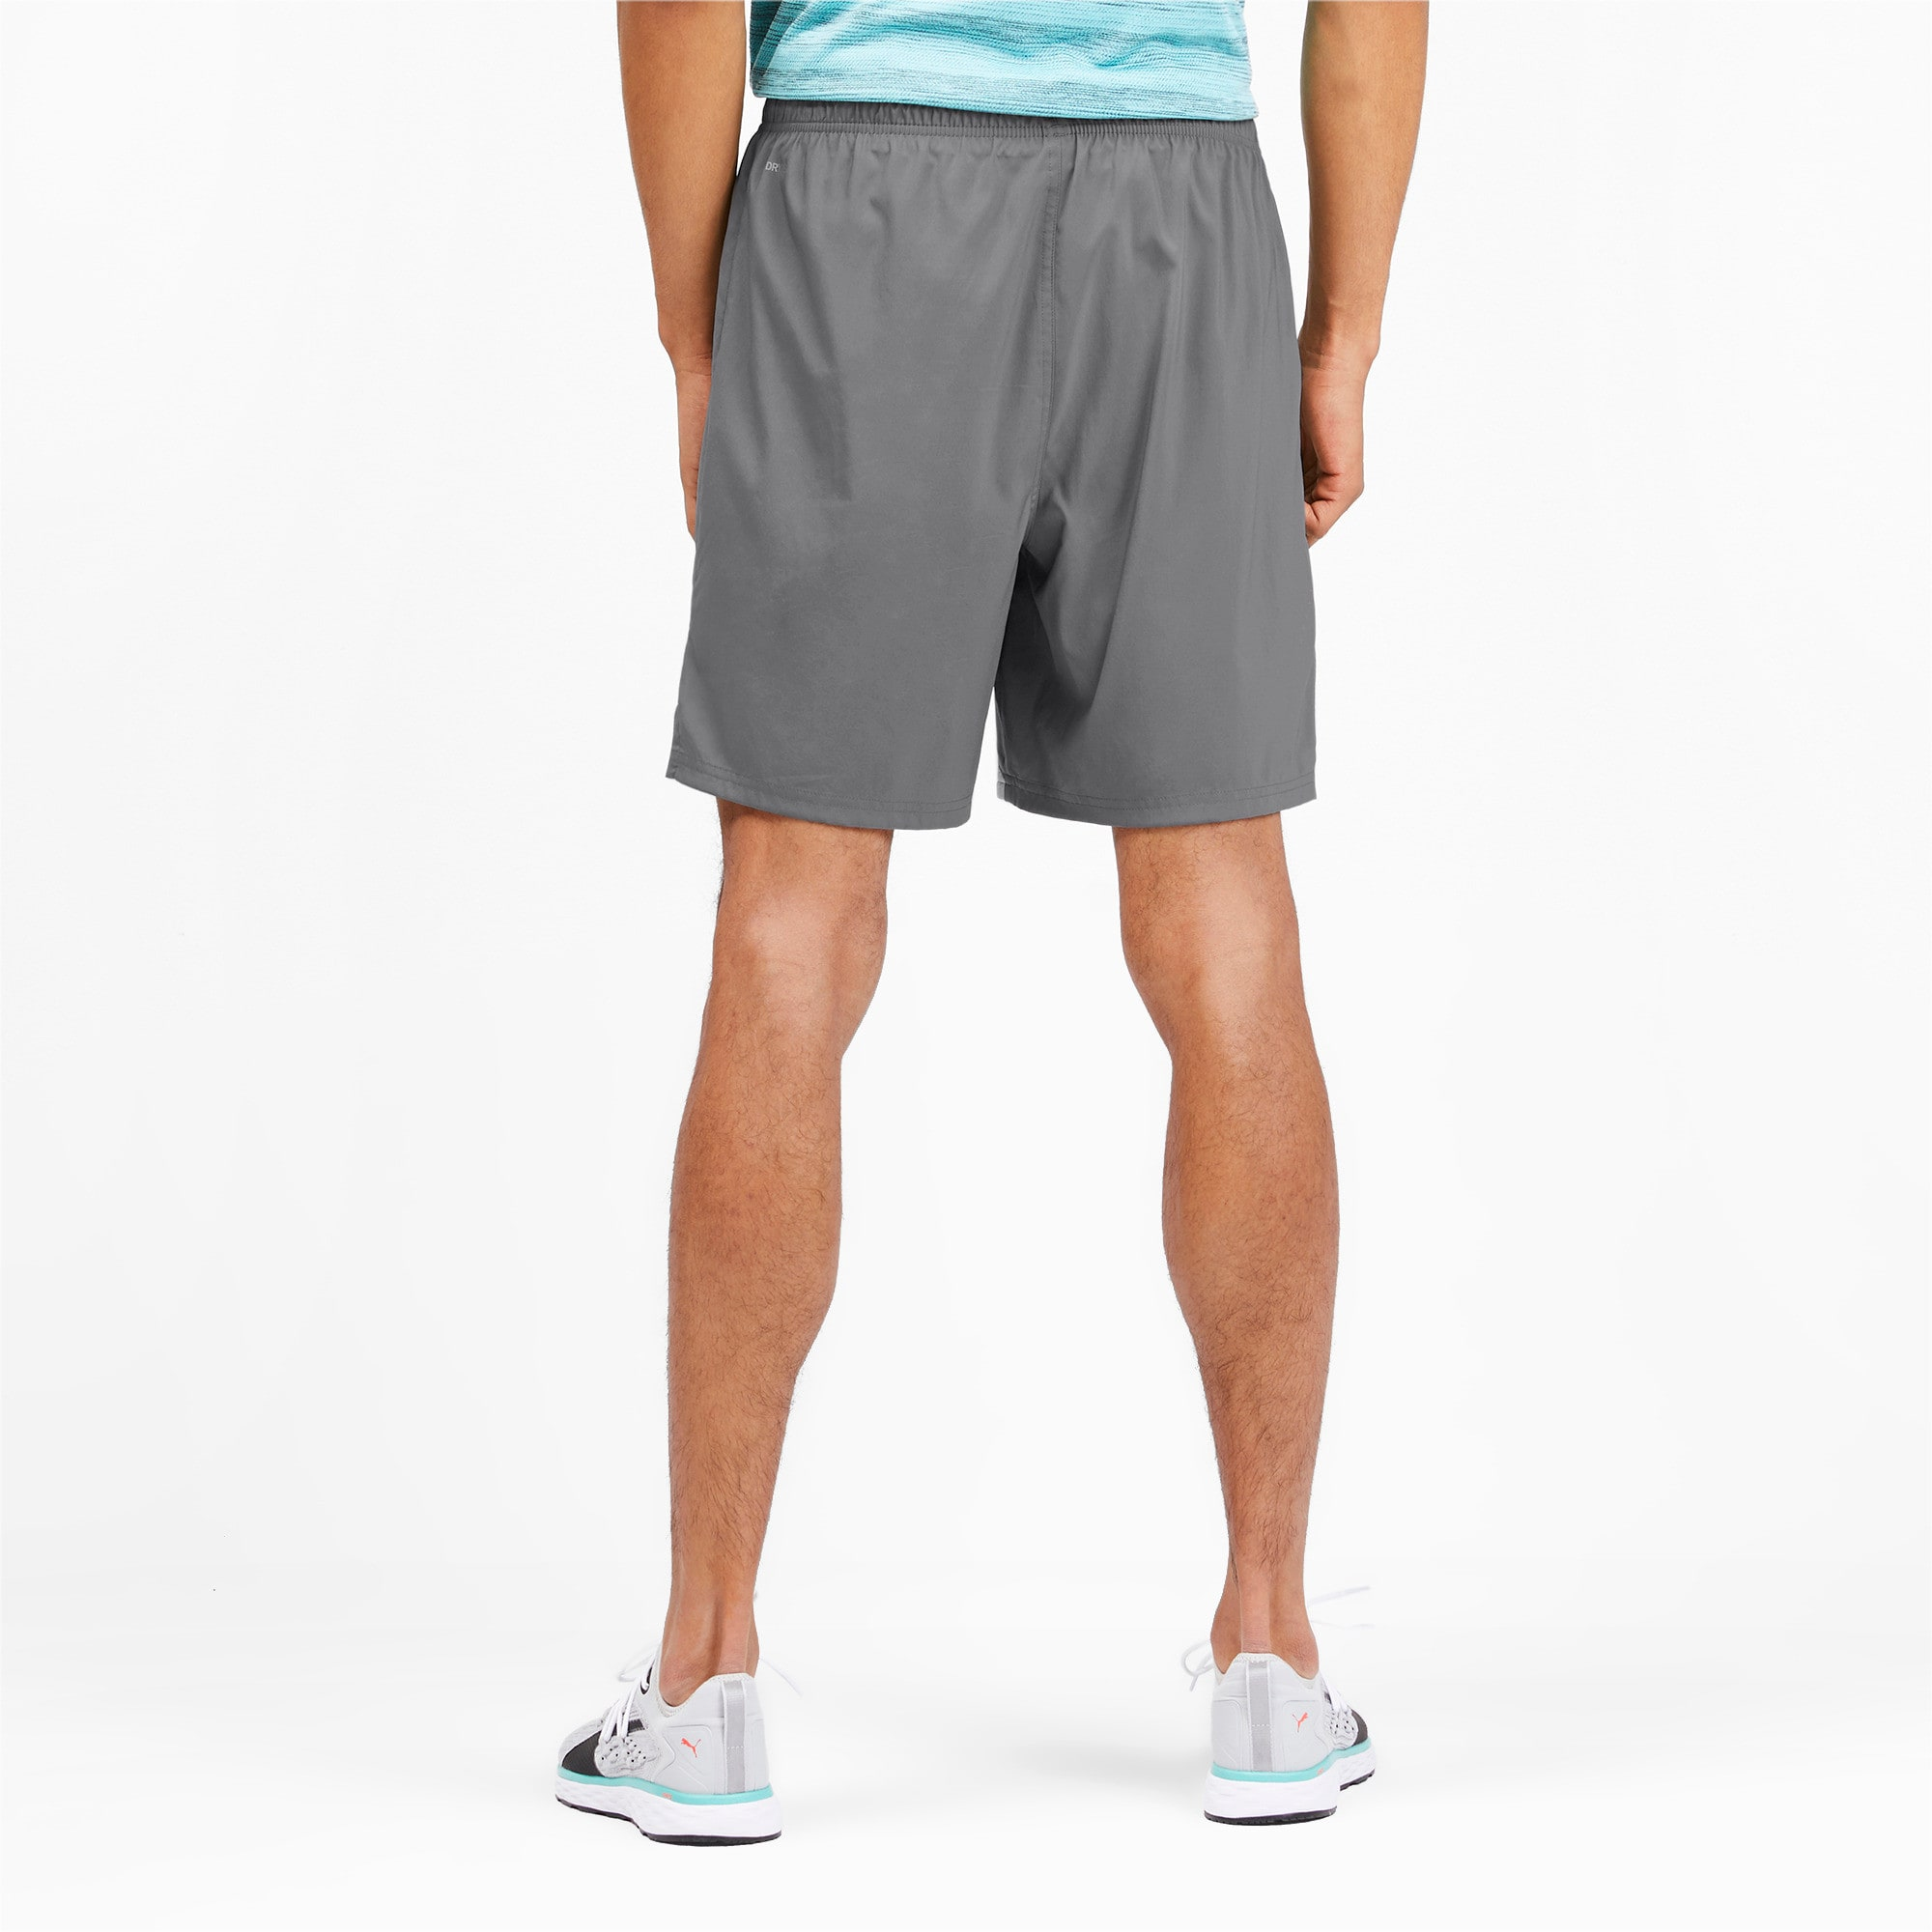 "Thumbnail 2 of Ignite Blocked Men's 7"" Shorts, CASTLEROCK-Blue Turquoise, medium"